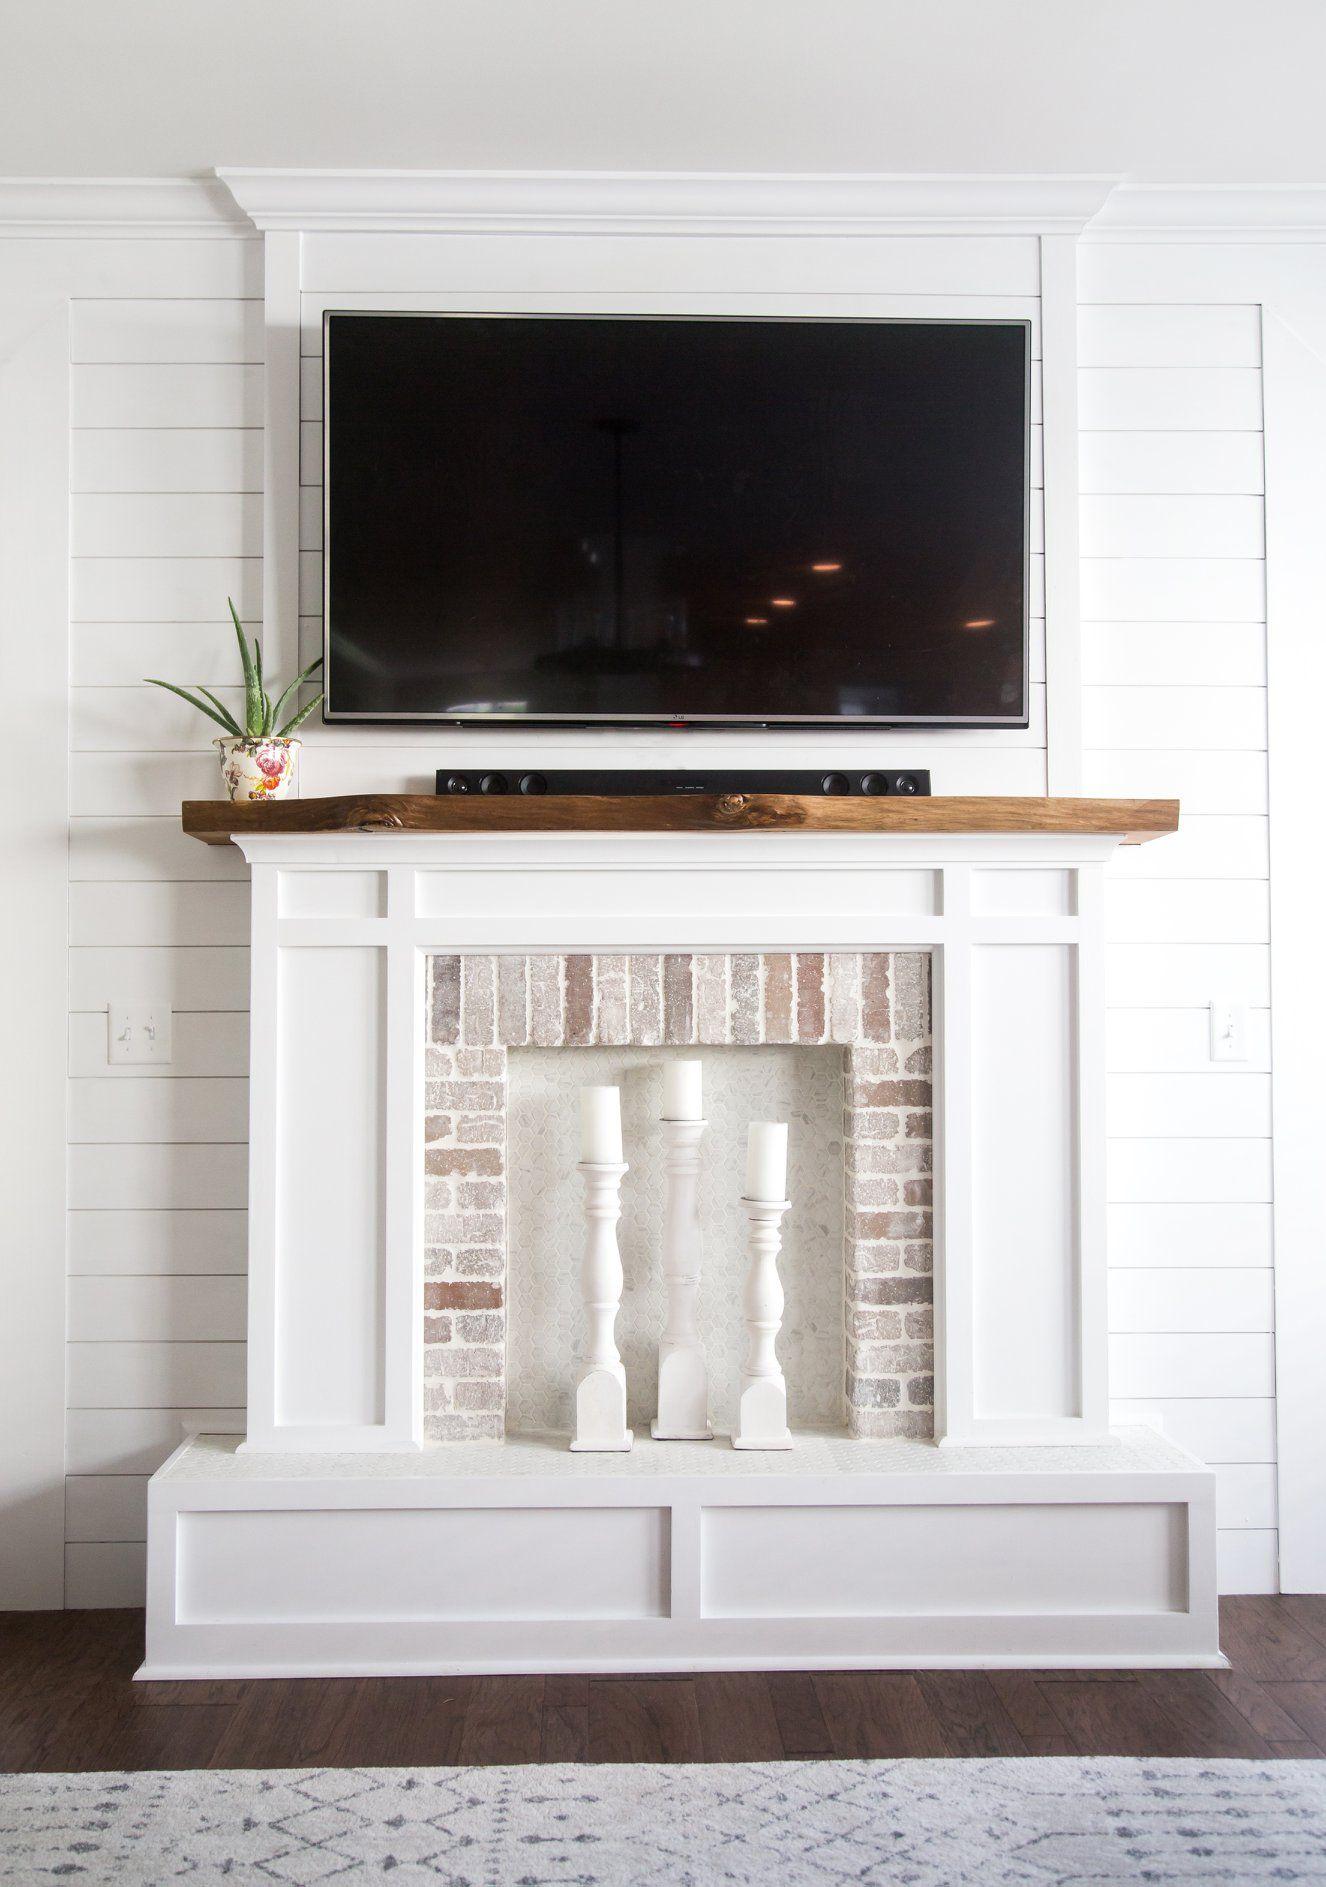 DIY Faux Fireplace and Shiplap wall Faux fireplace, Diy